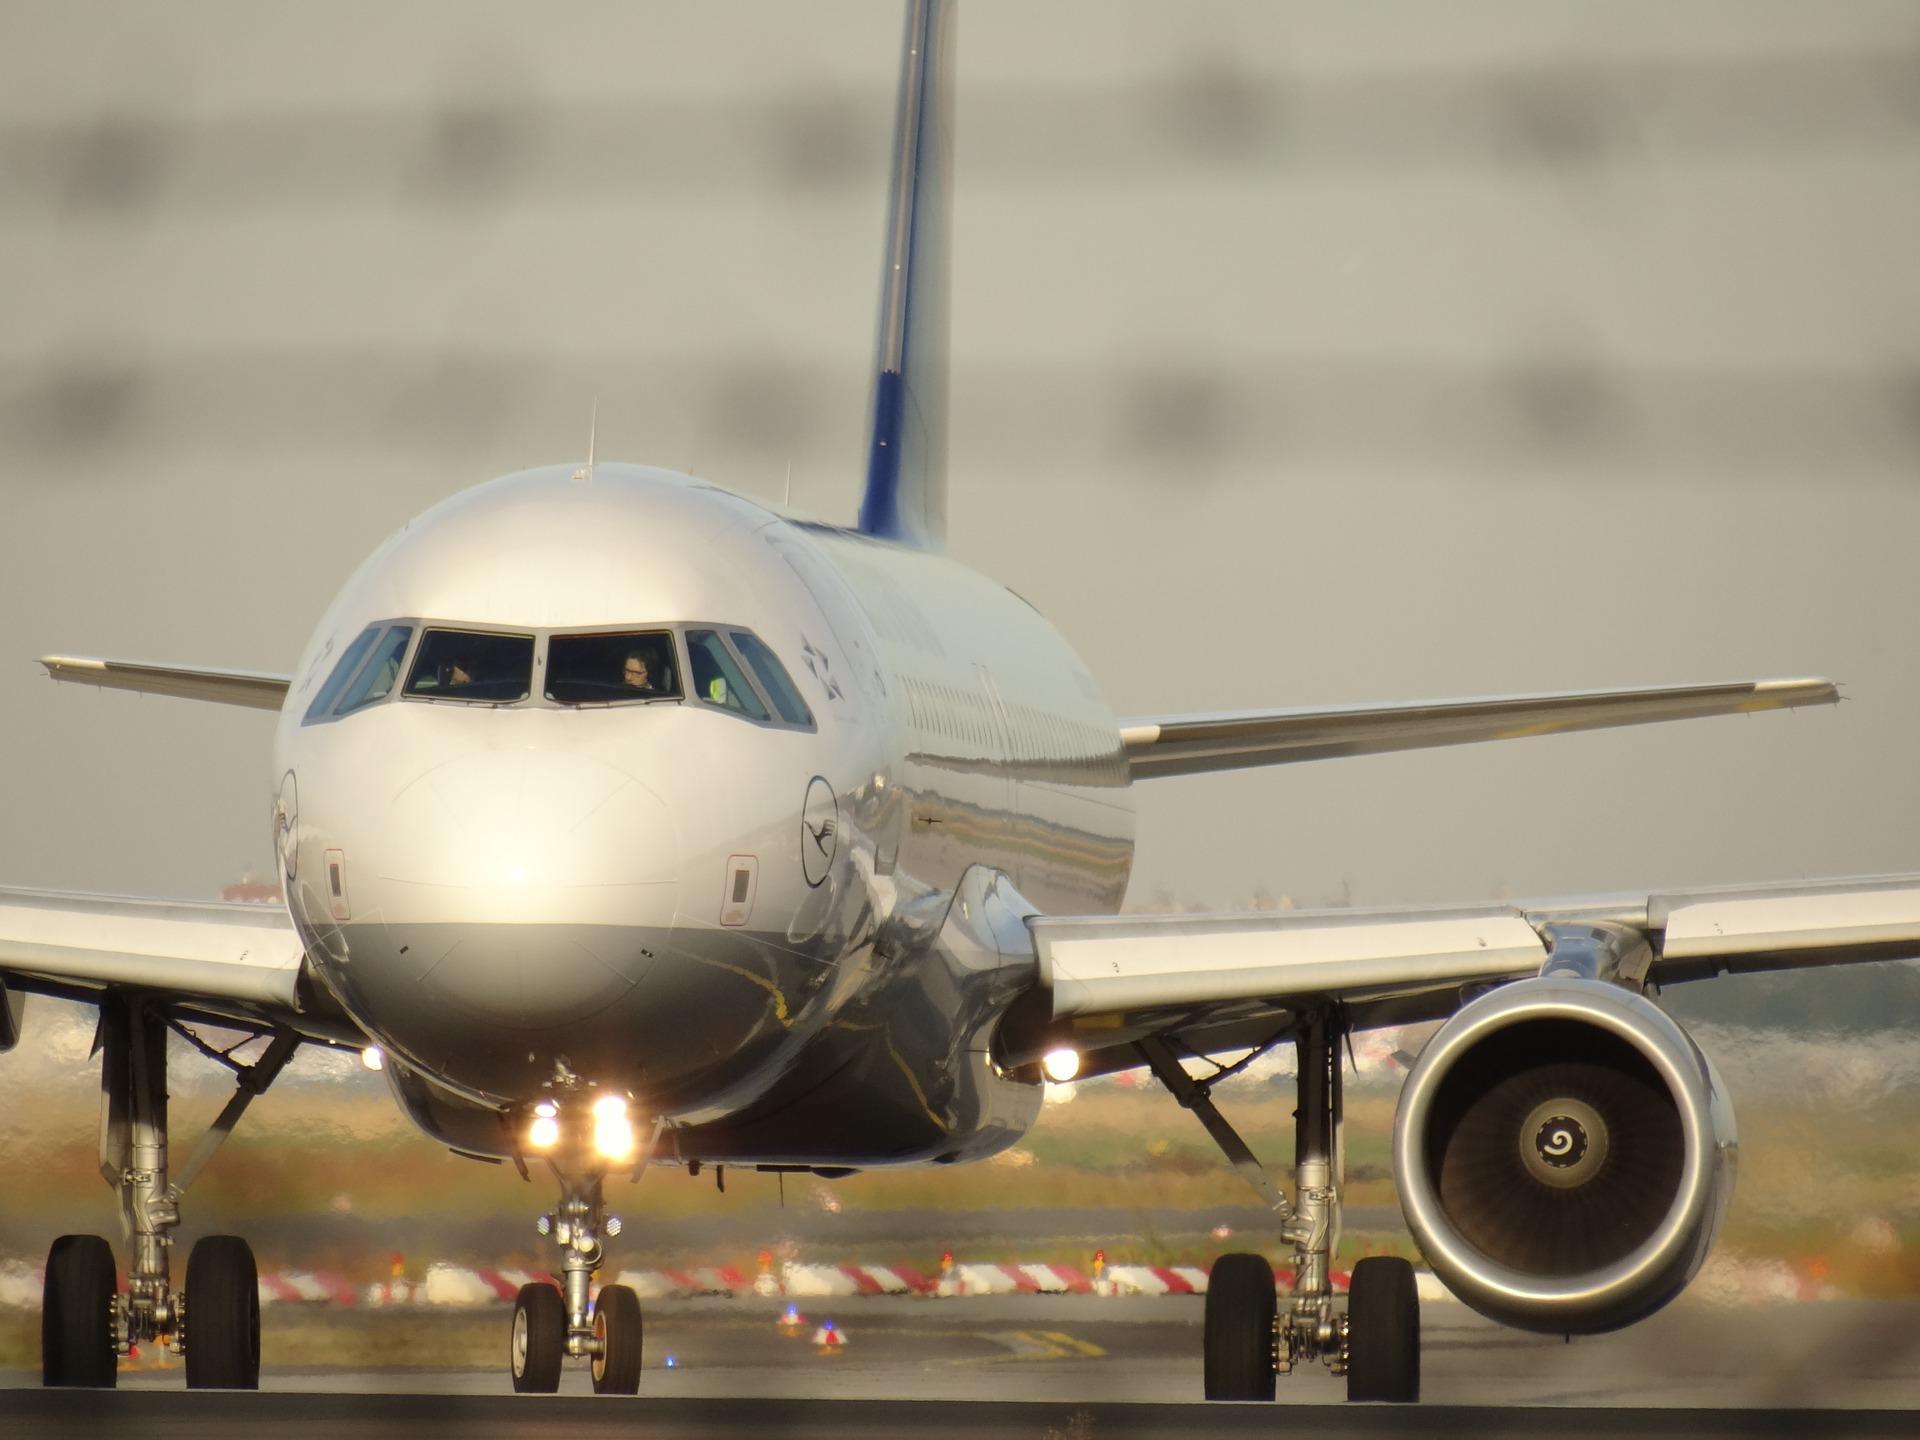 фото пассажирского самолета идет на посадку фото